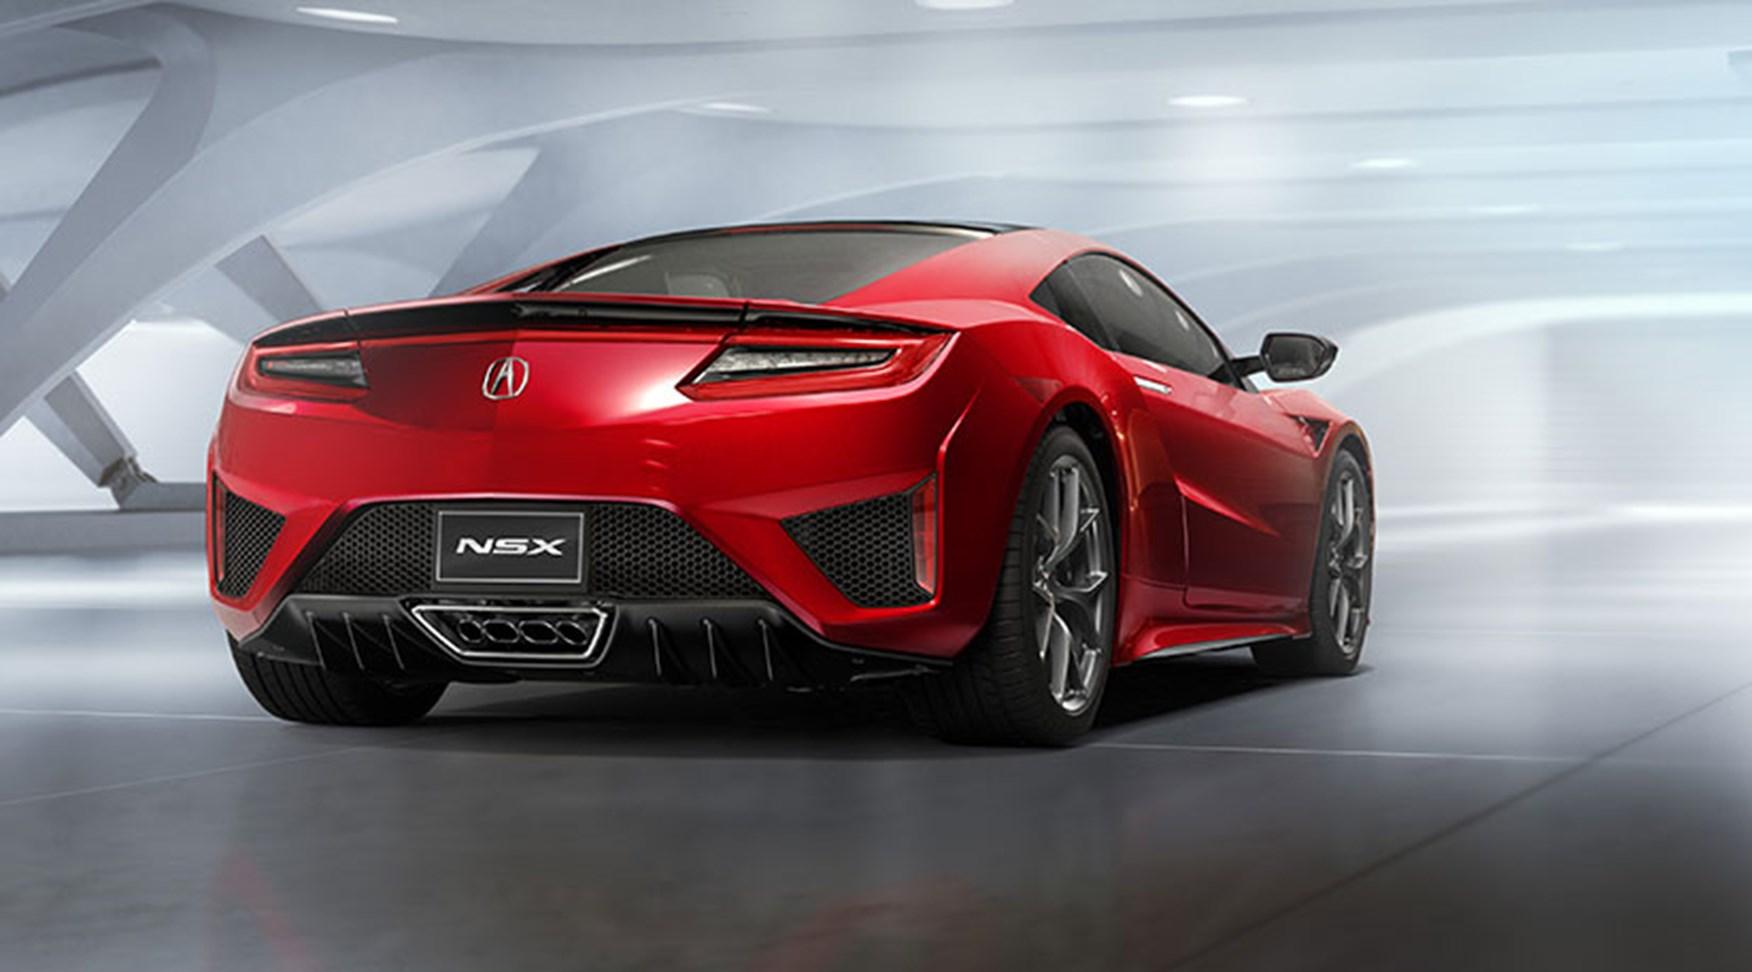 Honda Nsx 2016 Acura S Hybrid Sports Car At Detroit By